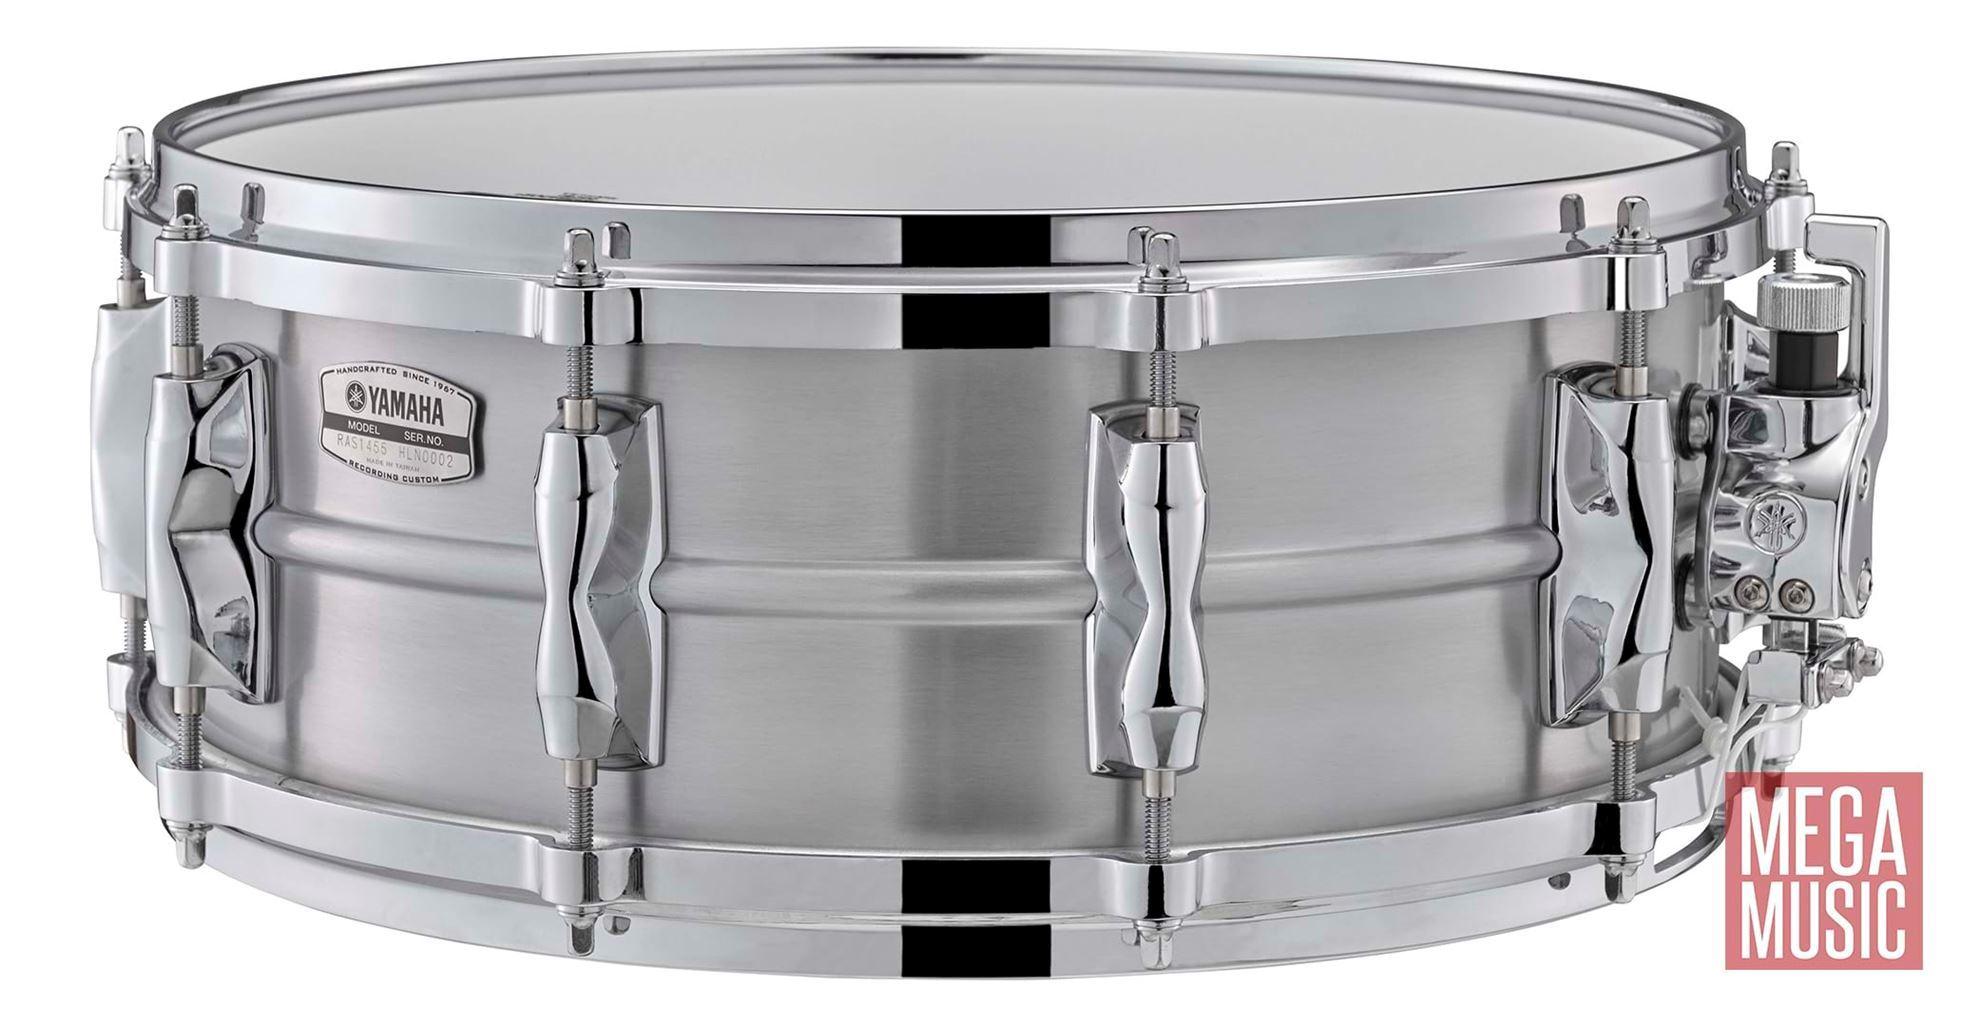 yamaha recording custom aluminium 14x5 5 snare drum perth mega music online. Black Bedroom Furniture Sets. Home Design Ideas